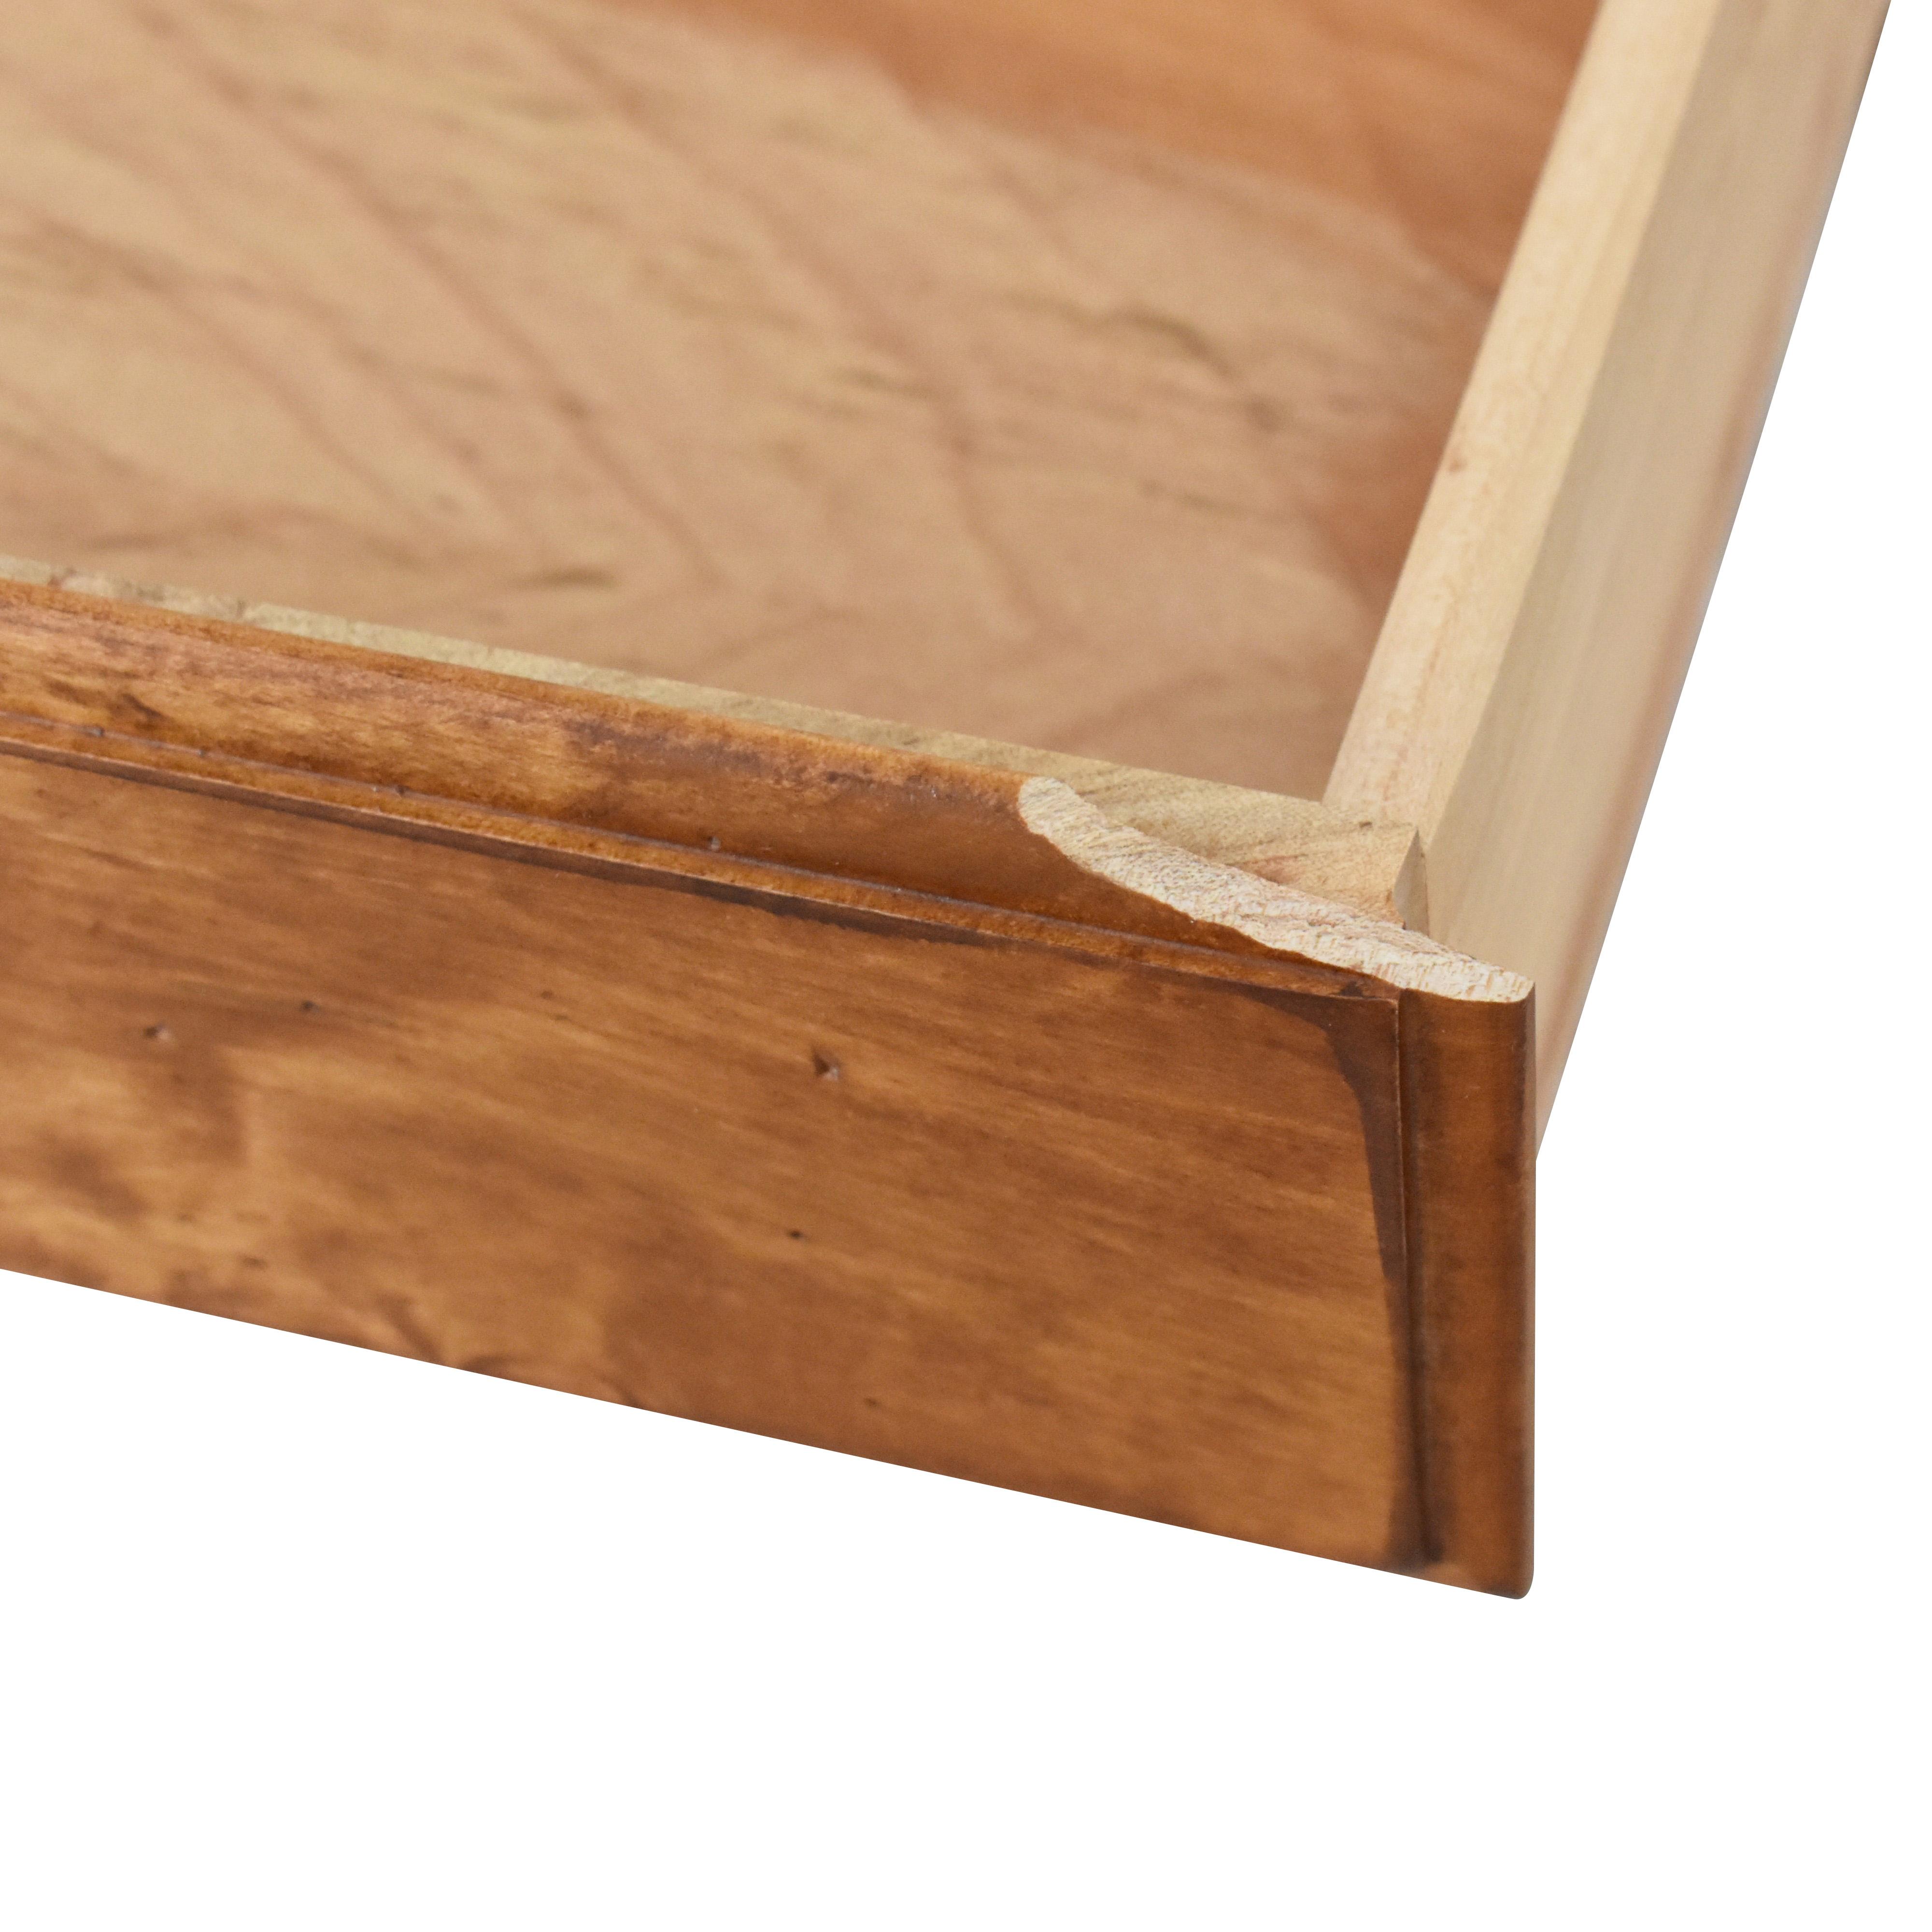 Ethan Allen Ethan Allen Single Drawer End Table dimensions